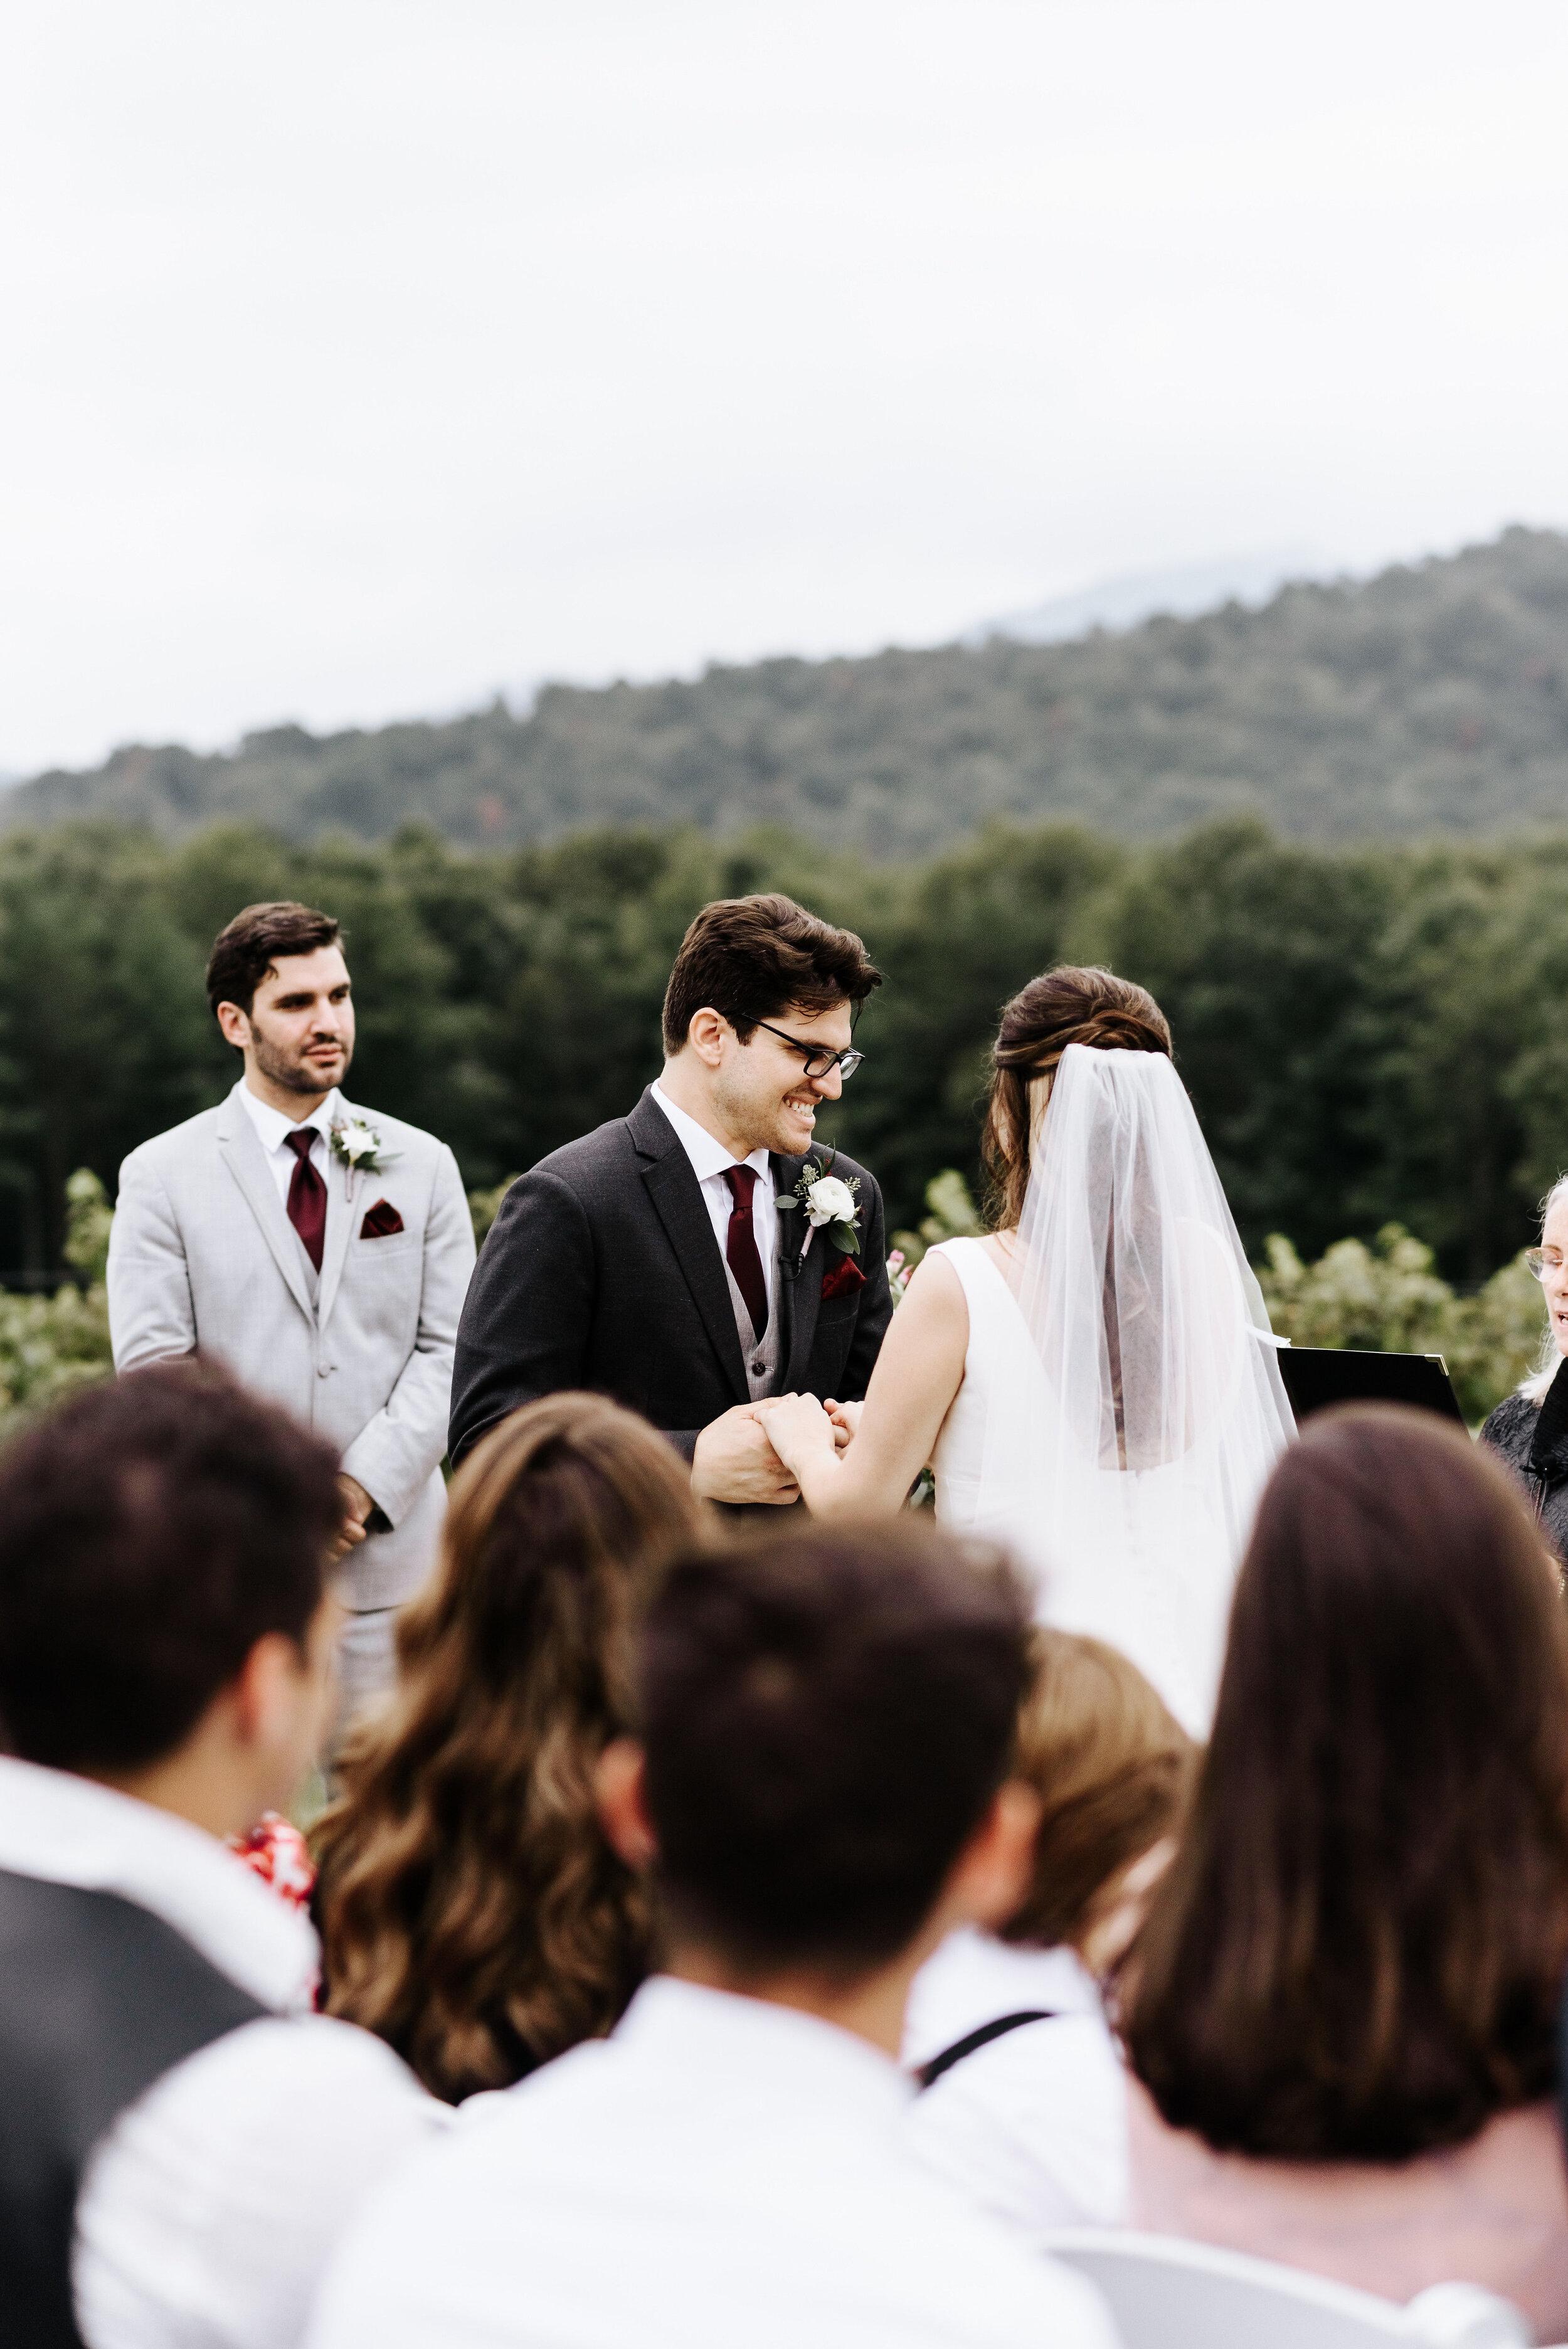 Allison_Nolan_Moss_Vineyards_Wedding_Charlottesville_Virginia_Photography_by_V_47.jpg